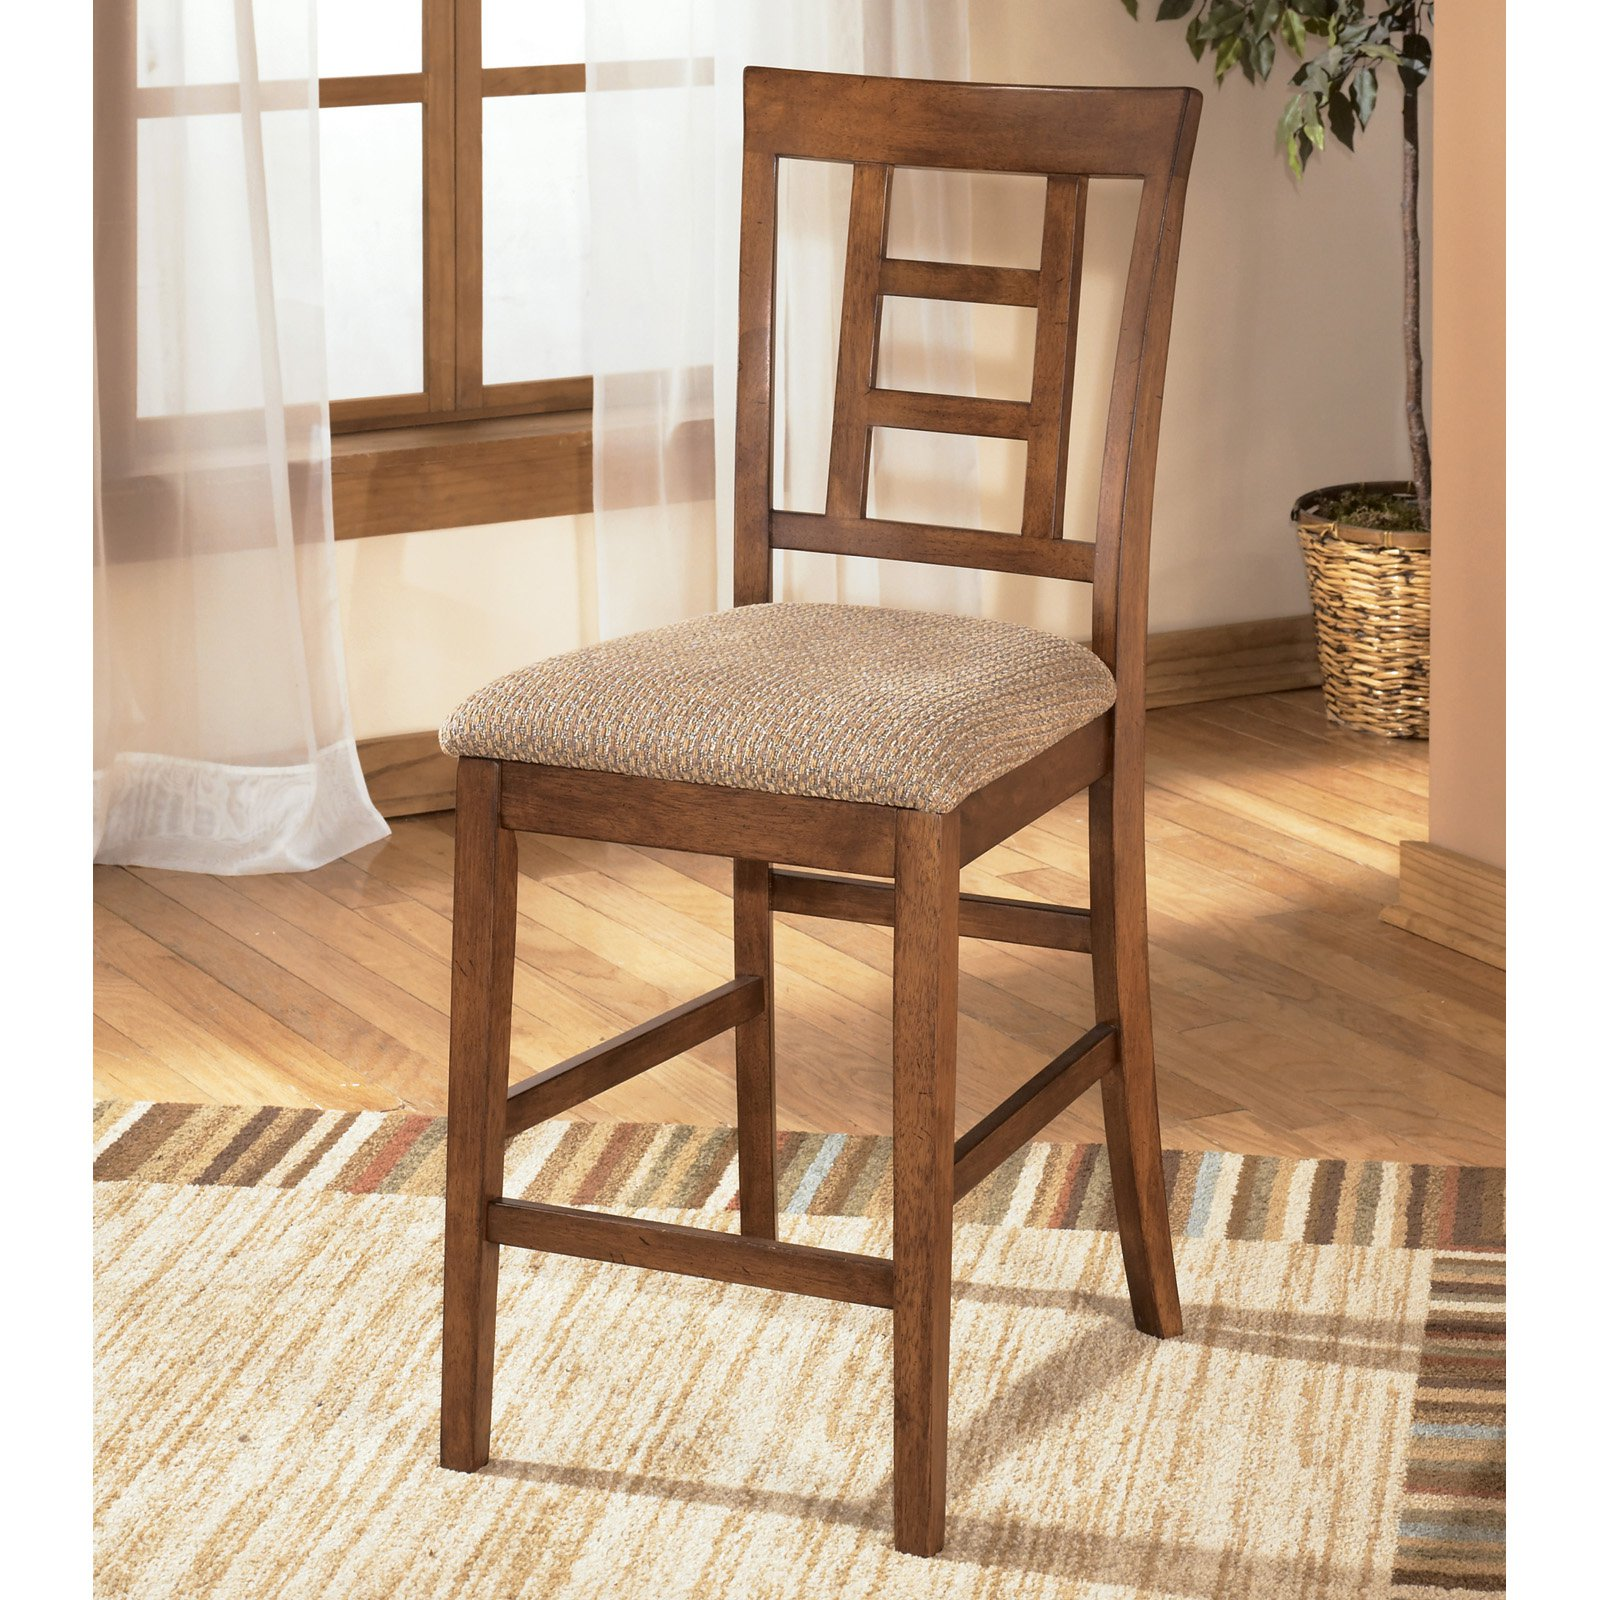 Ashley Cross Island Medium Brown Upholstered Barstool Set of 2 D319-324